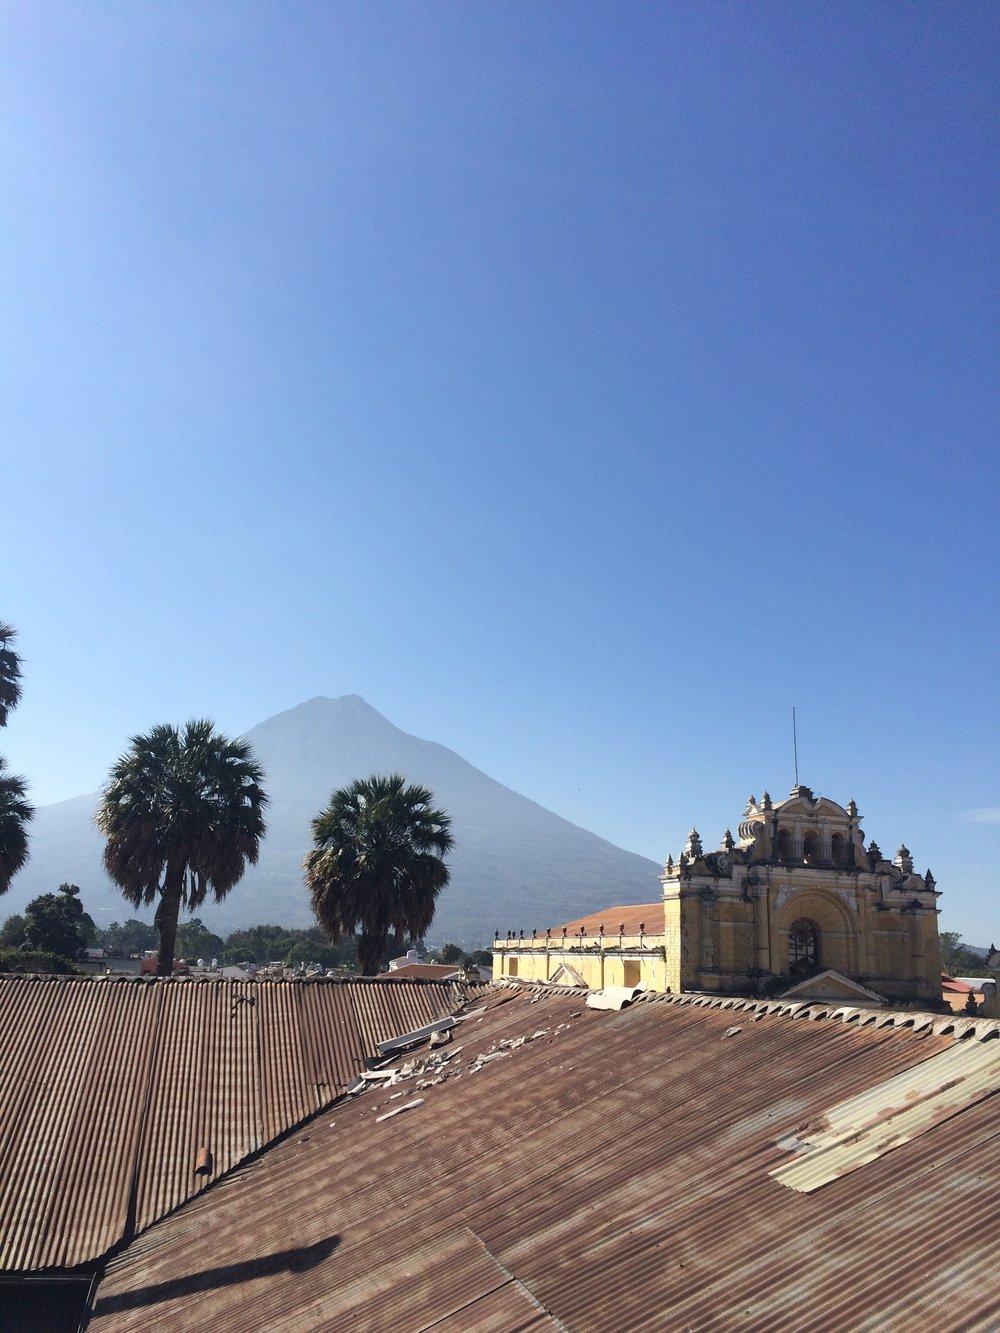 Hostel Cucuruchos, Antigua, Guatemala